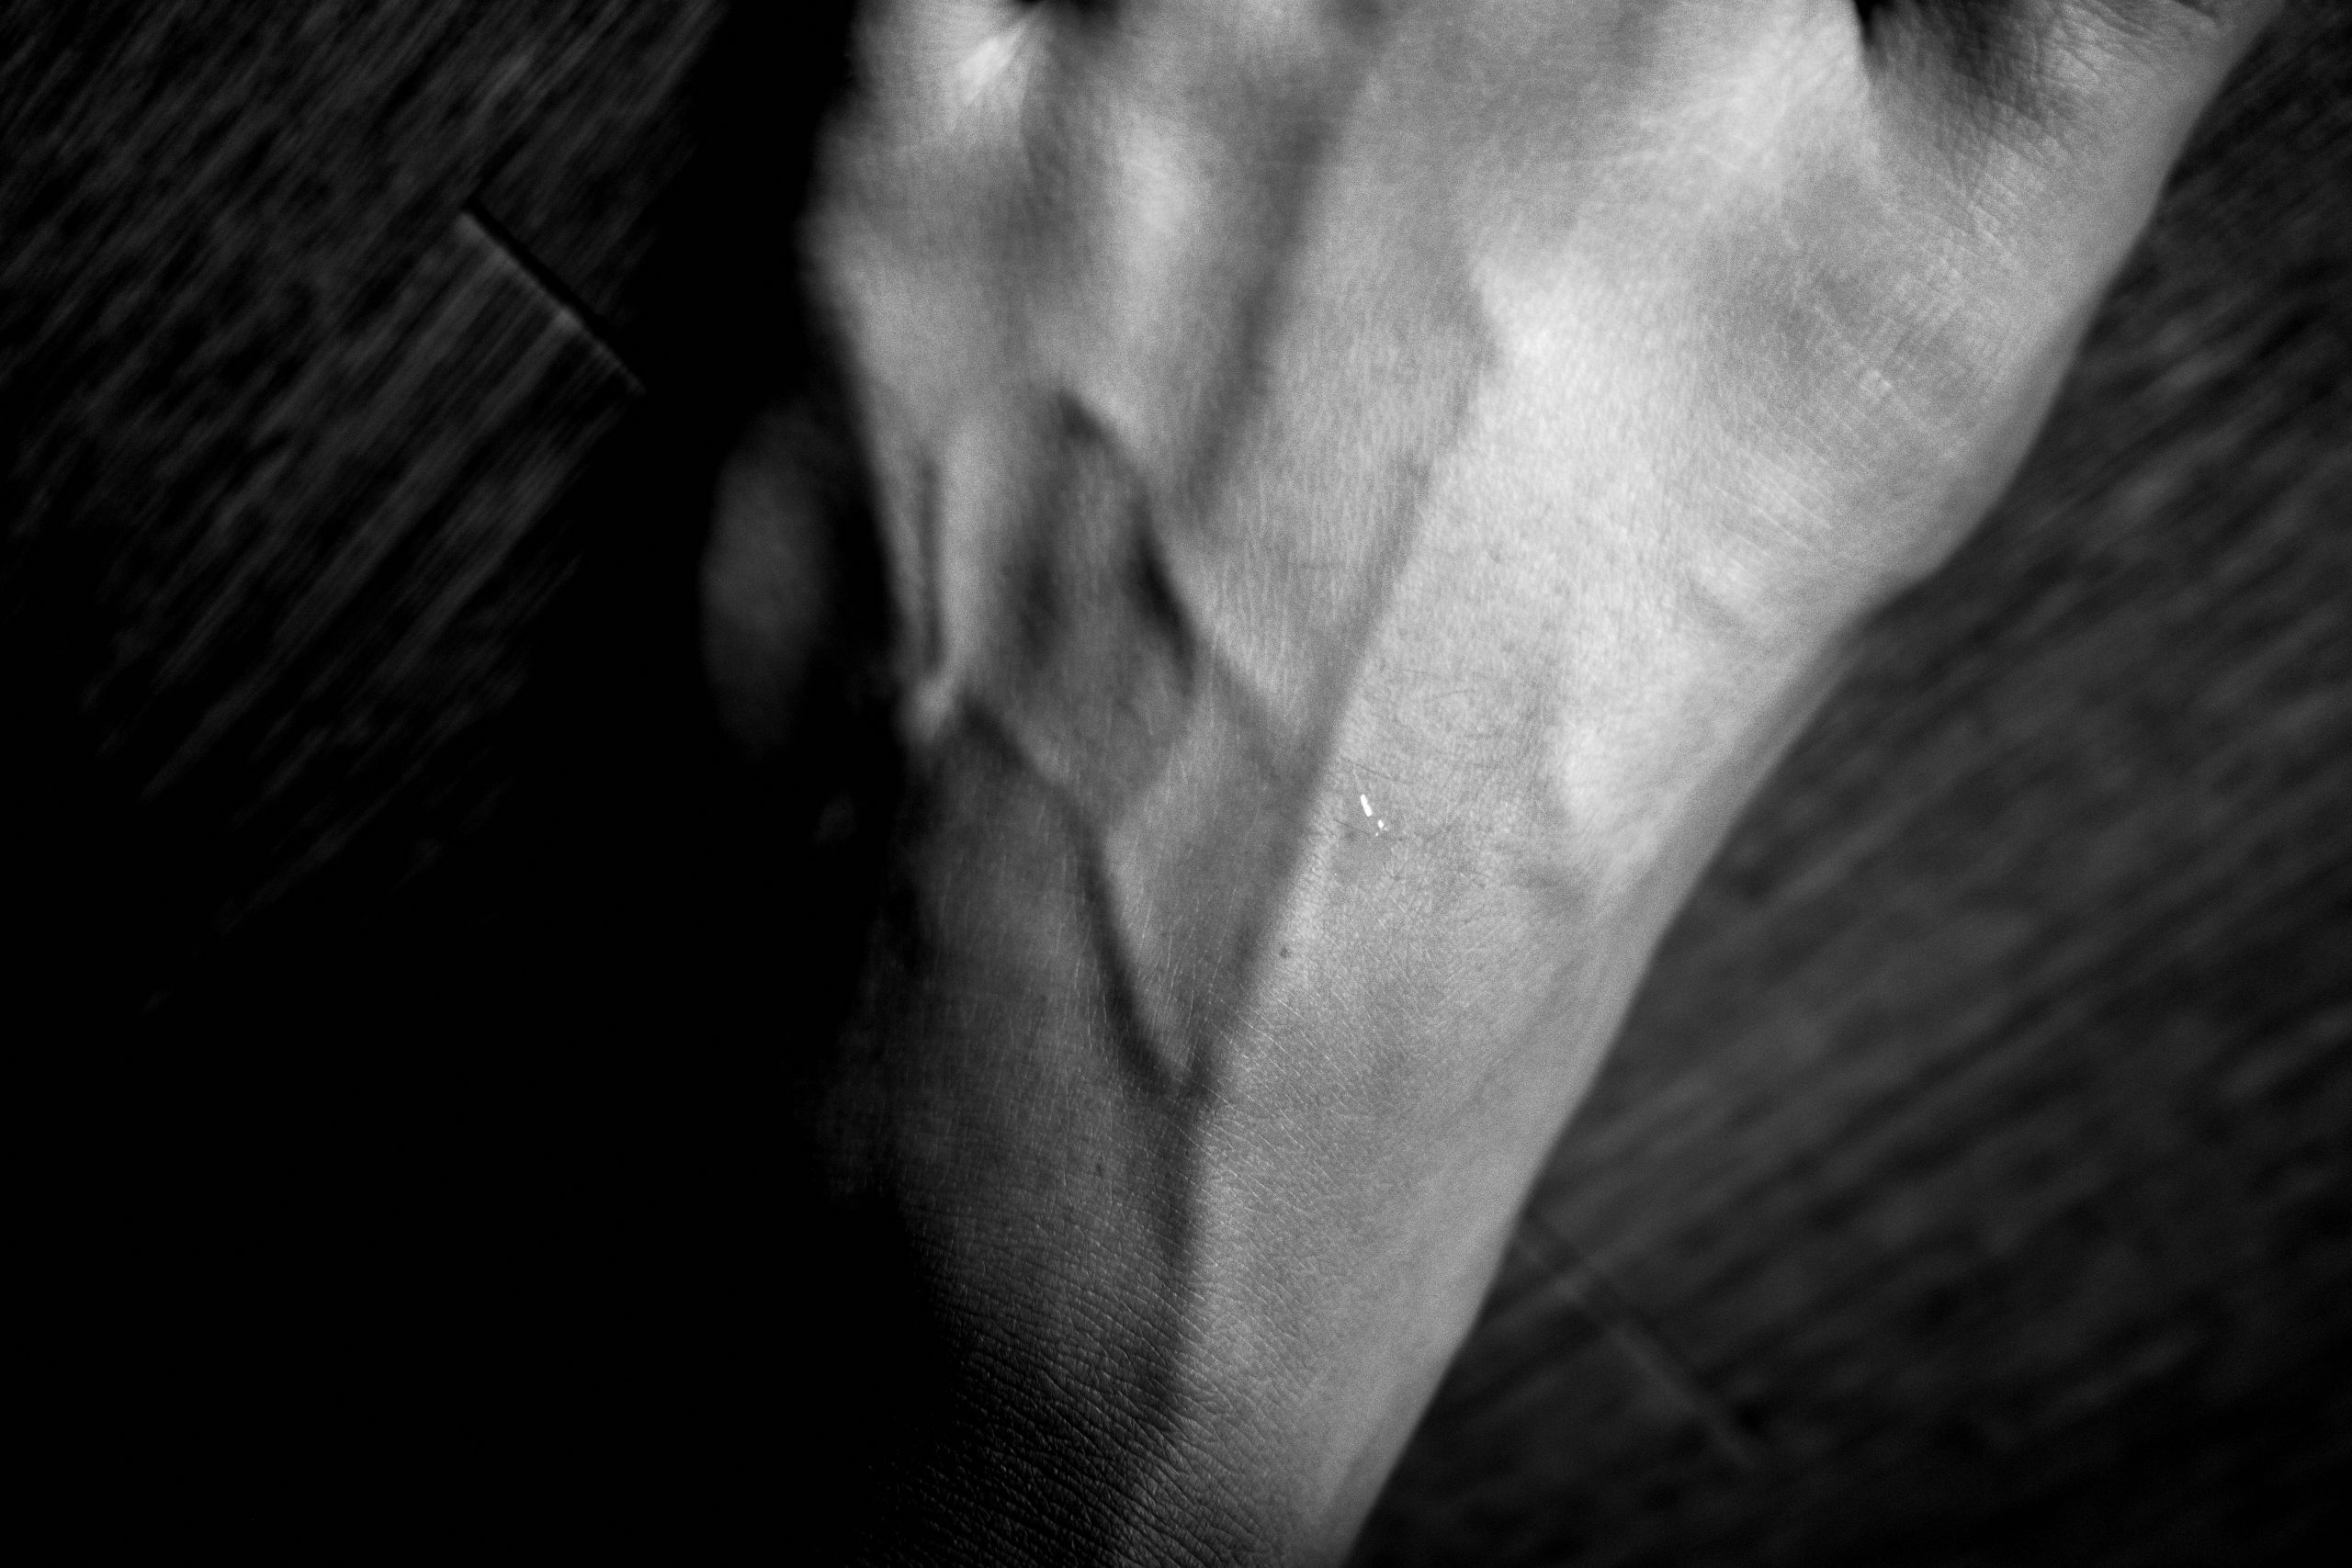 foot vein ERIC KIM